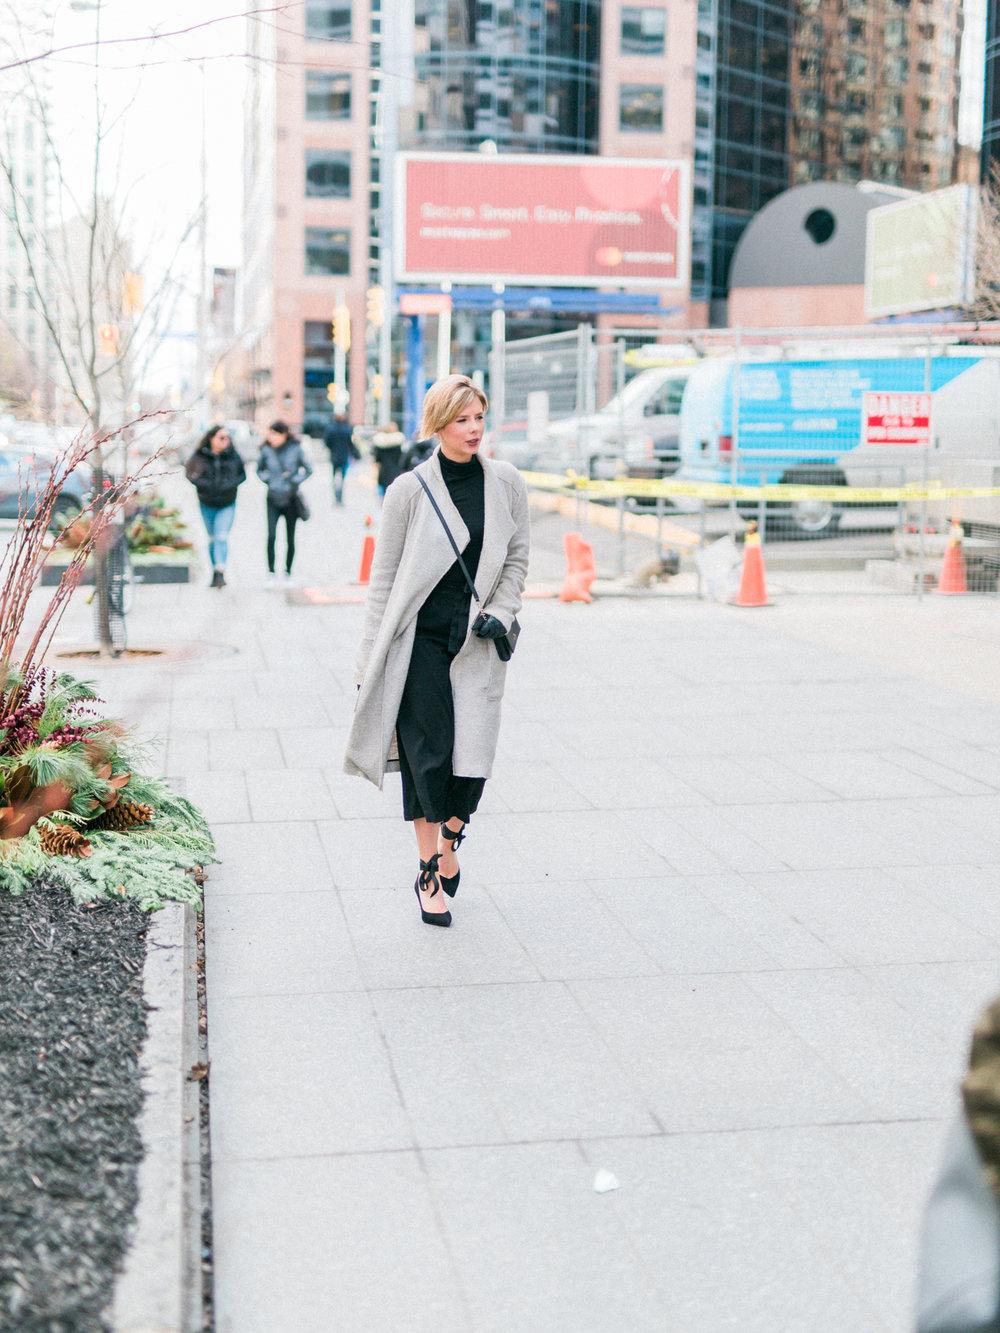 DanielleGirouxPhotography_Toronto_Portrait_StreetPhotography_0C6A1021.jpg